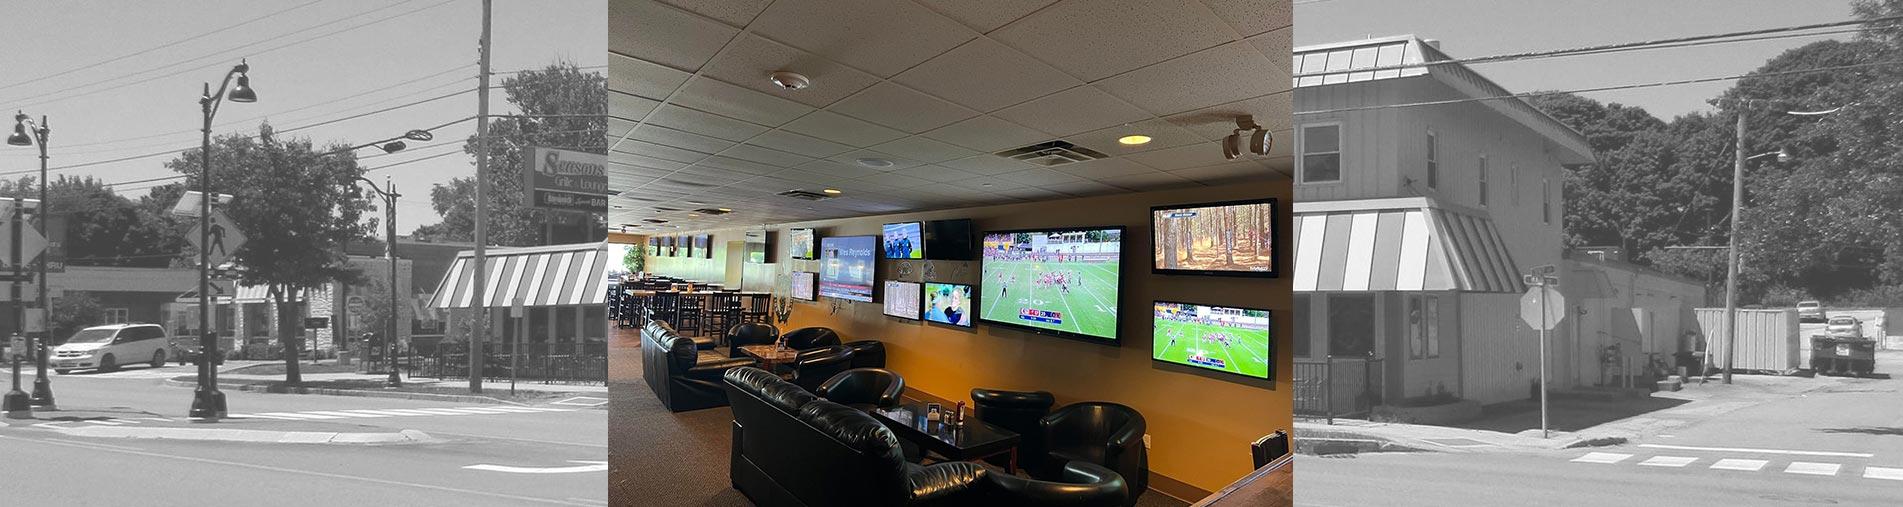 Seasons Restaurant And Sports Bar Bangor Restaurant The